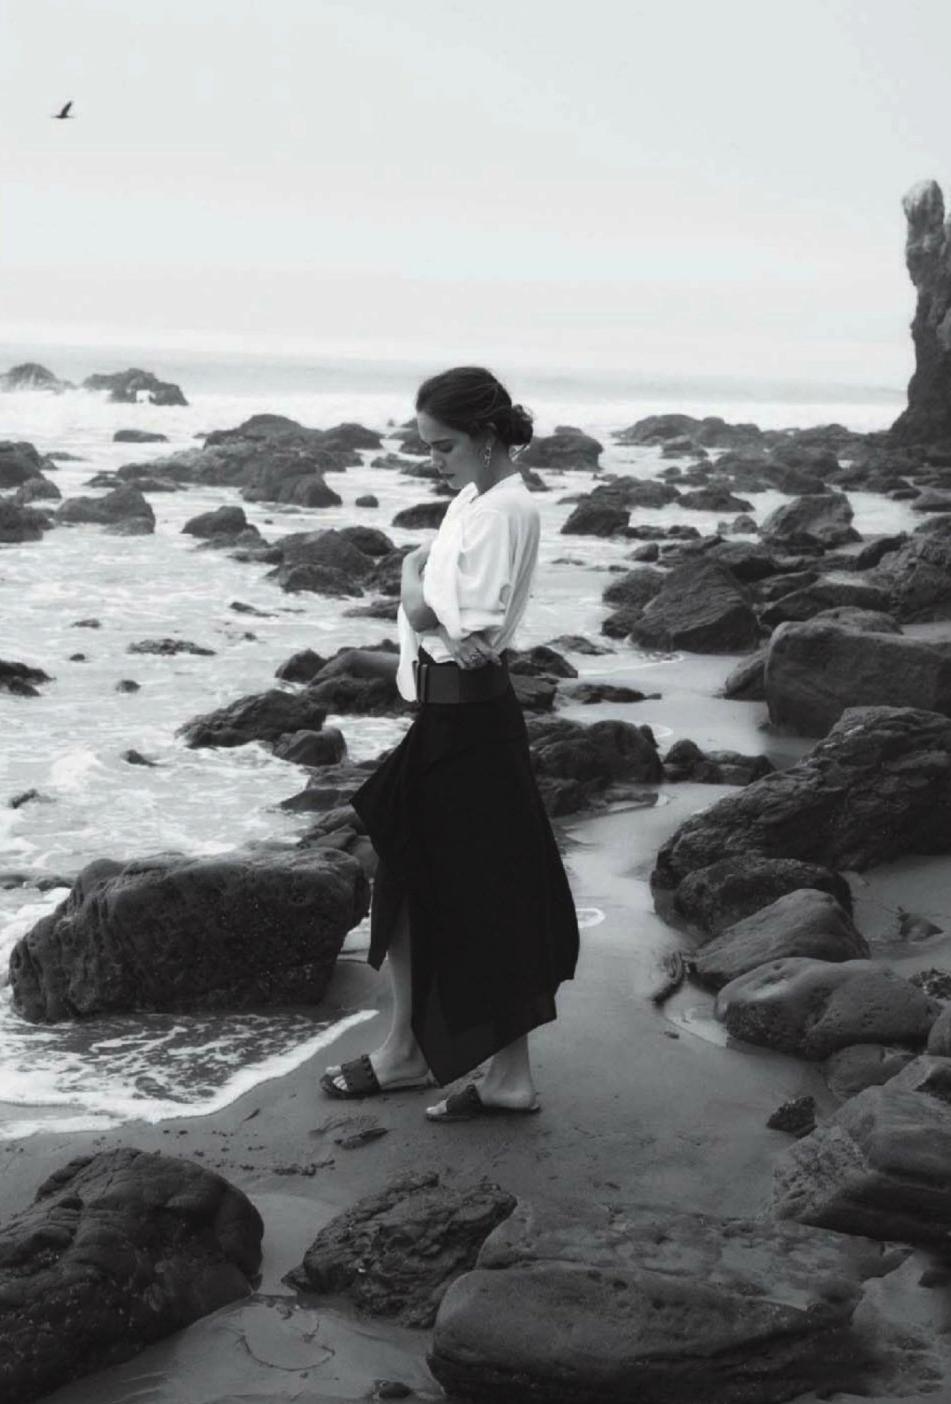 Matilda Lutz in Modern Romance / InStyle US April 2016 (photography: David Alfons Wilhelm Bornscheuer, styling: Ali Pew) via www.fashionedbylove.co.uk